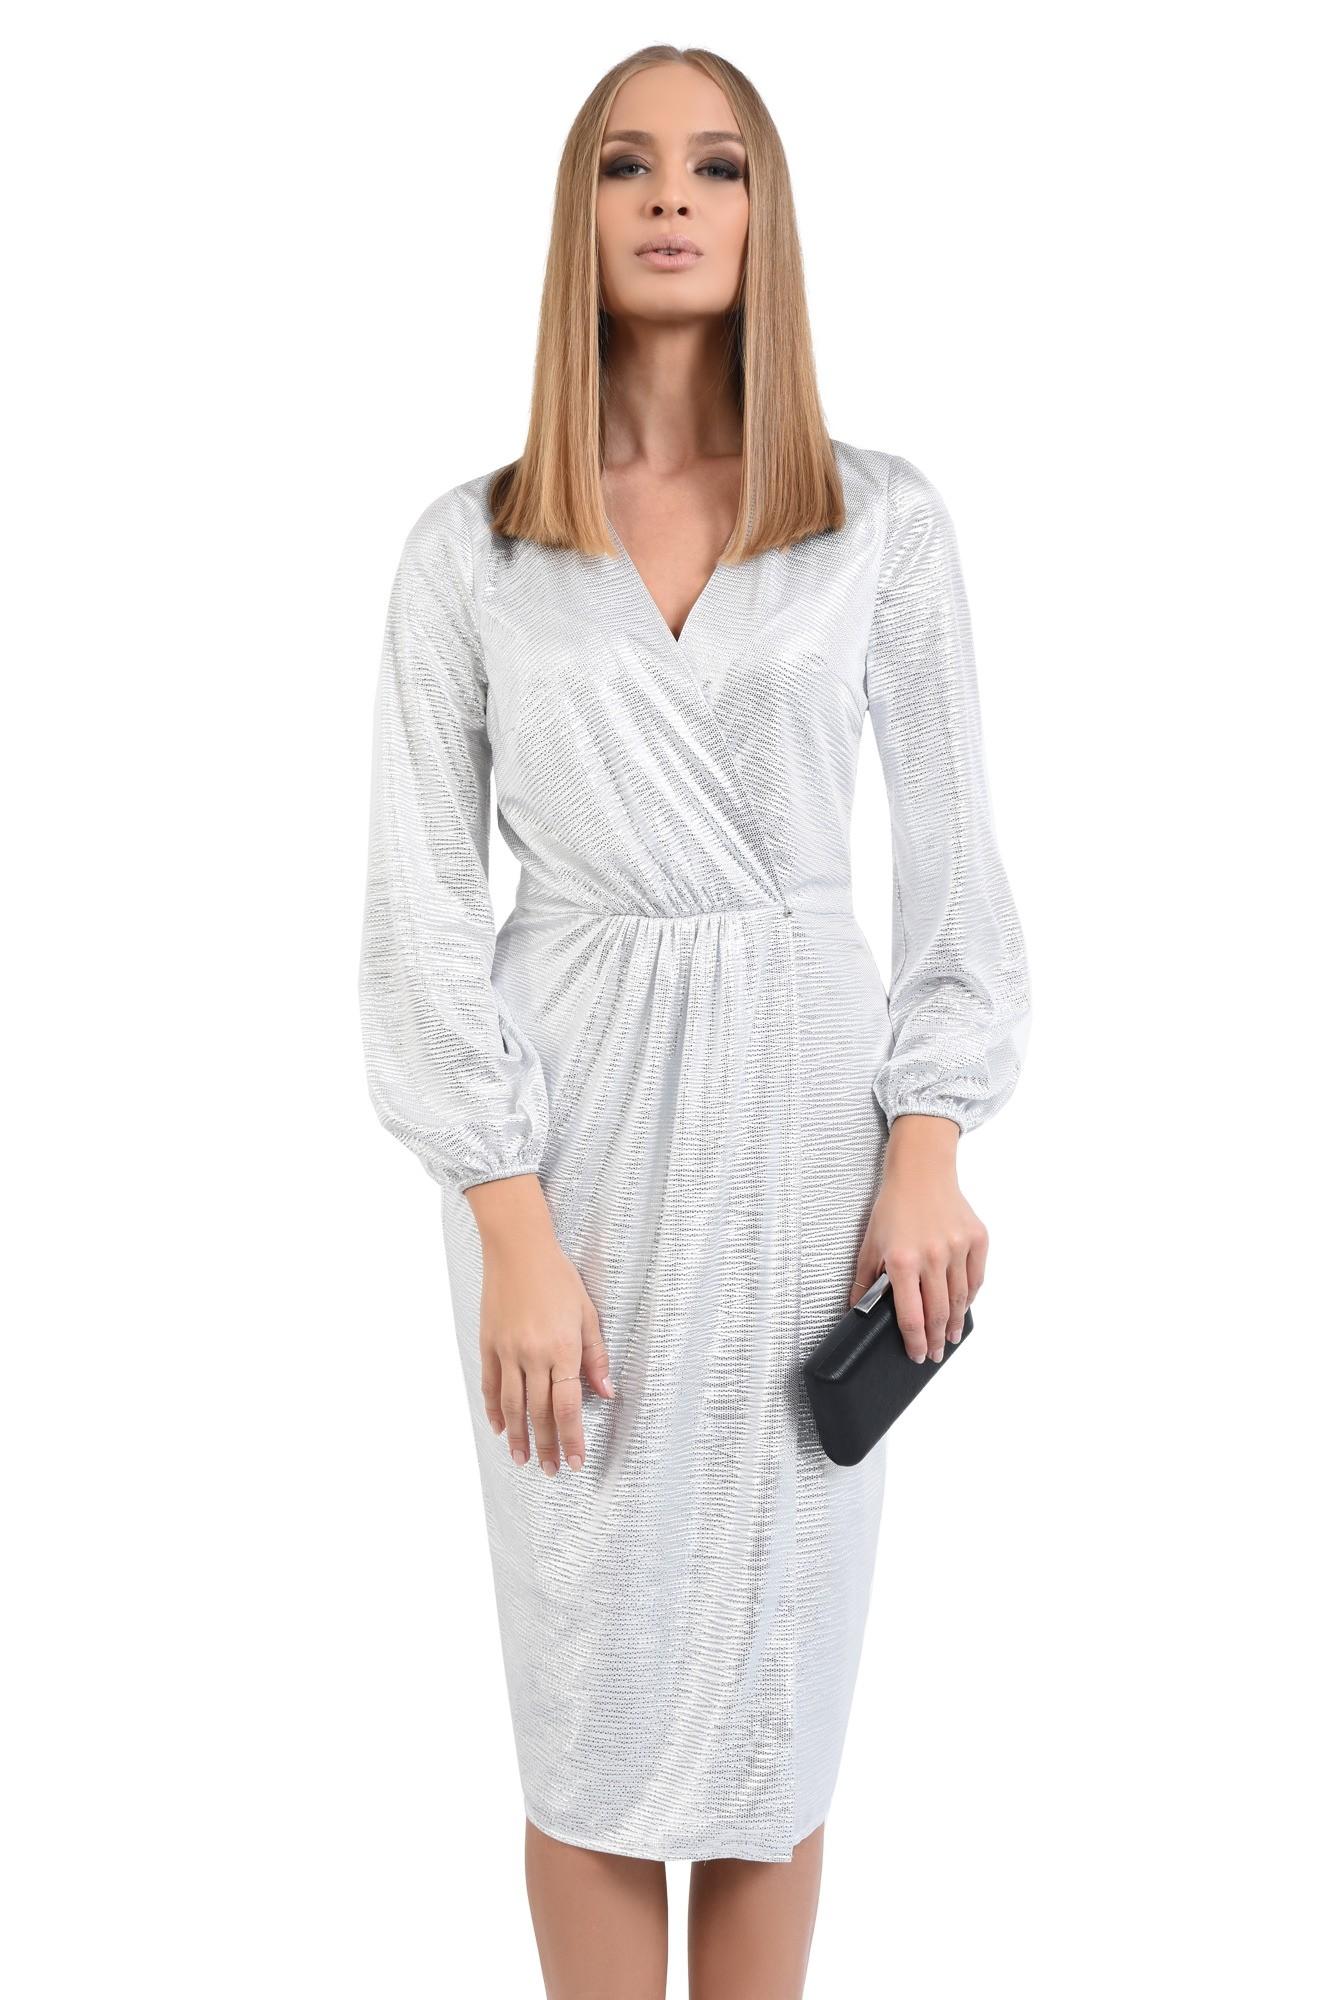 0 - rochie de seara, petrecuta, din lurex, argintie, drapata